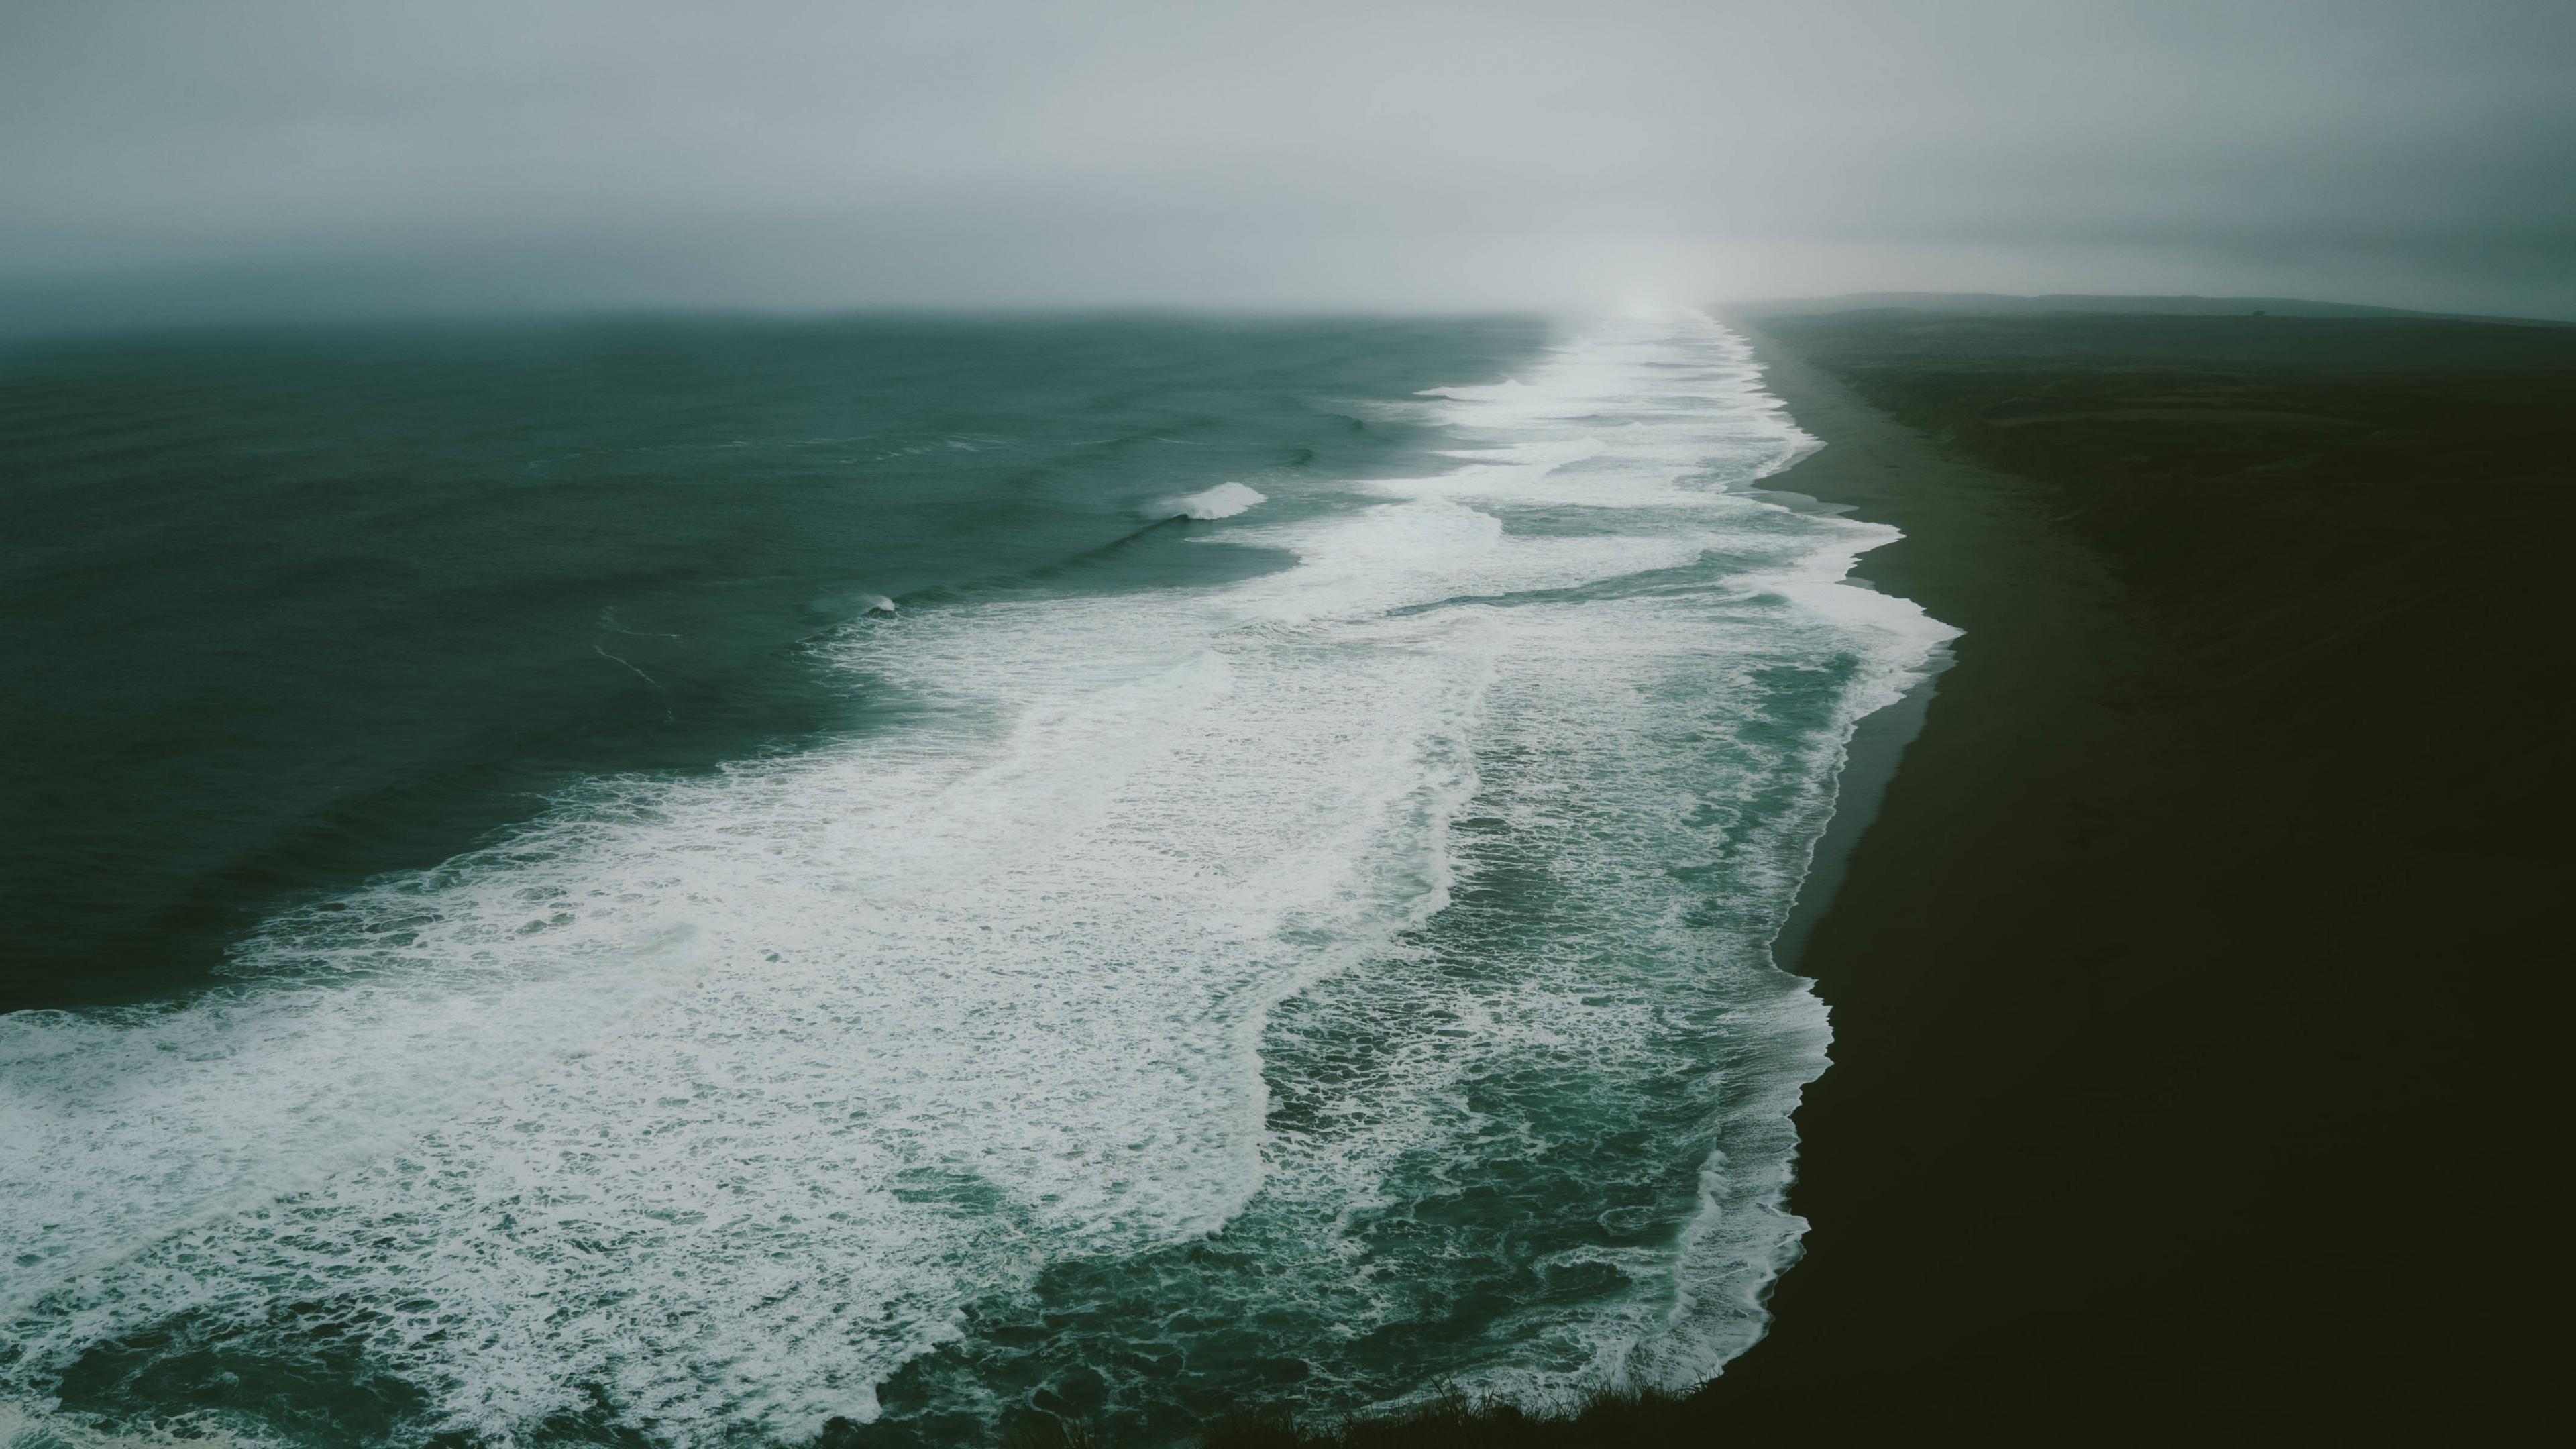 3840x2160 Ocean Sea Beach 4k HD 4k Wallpapers, Images ...